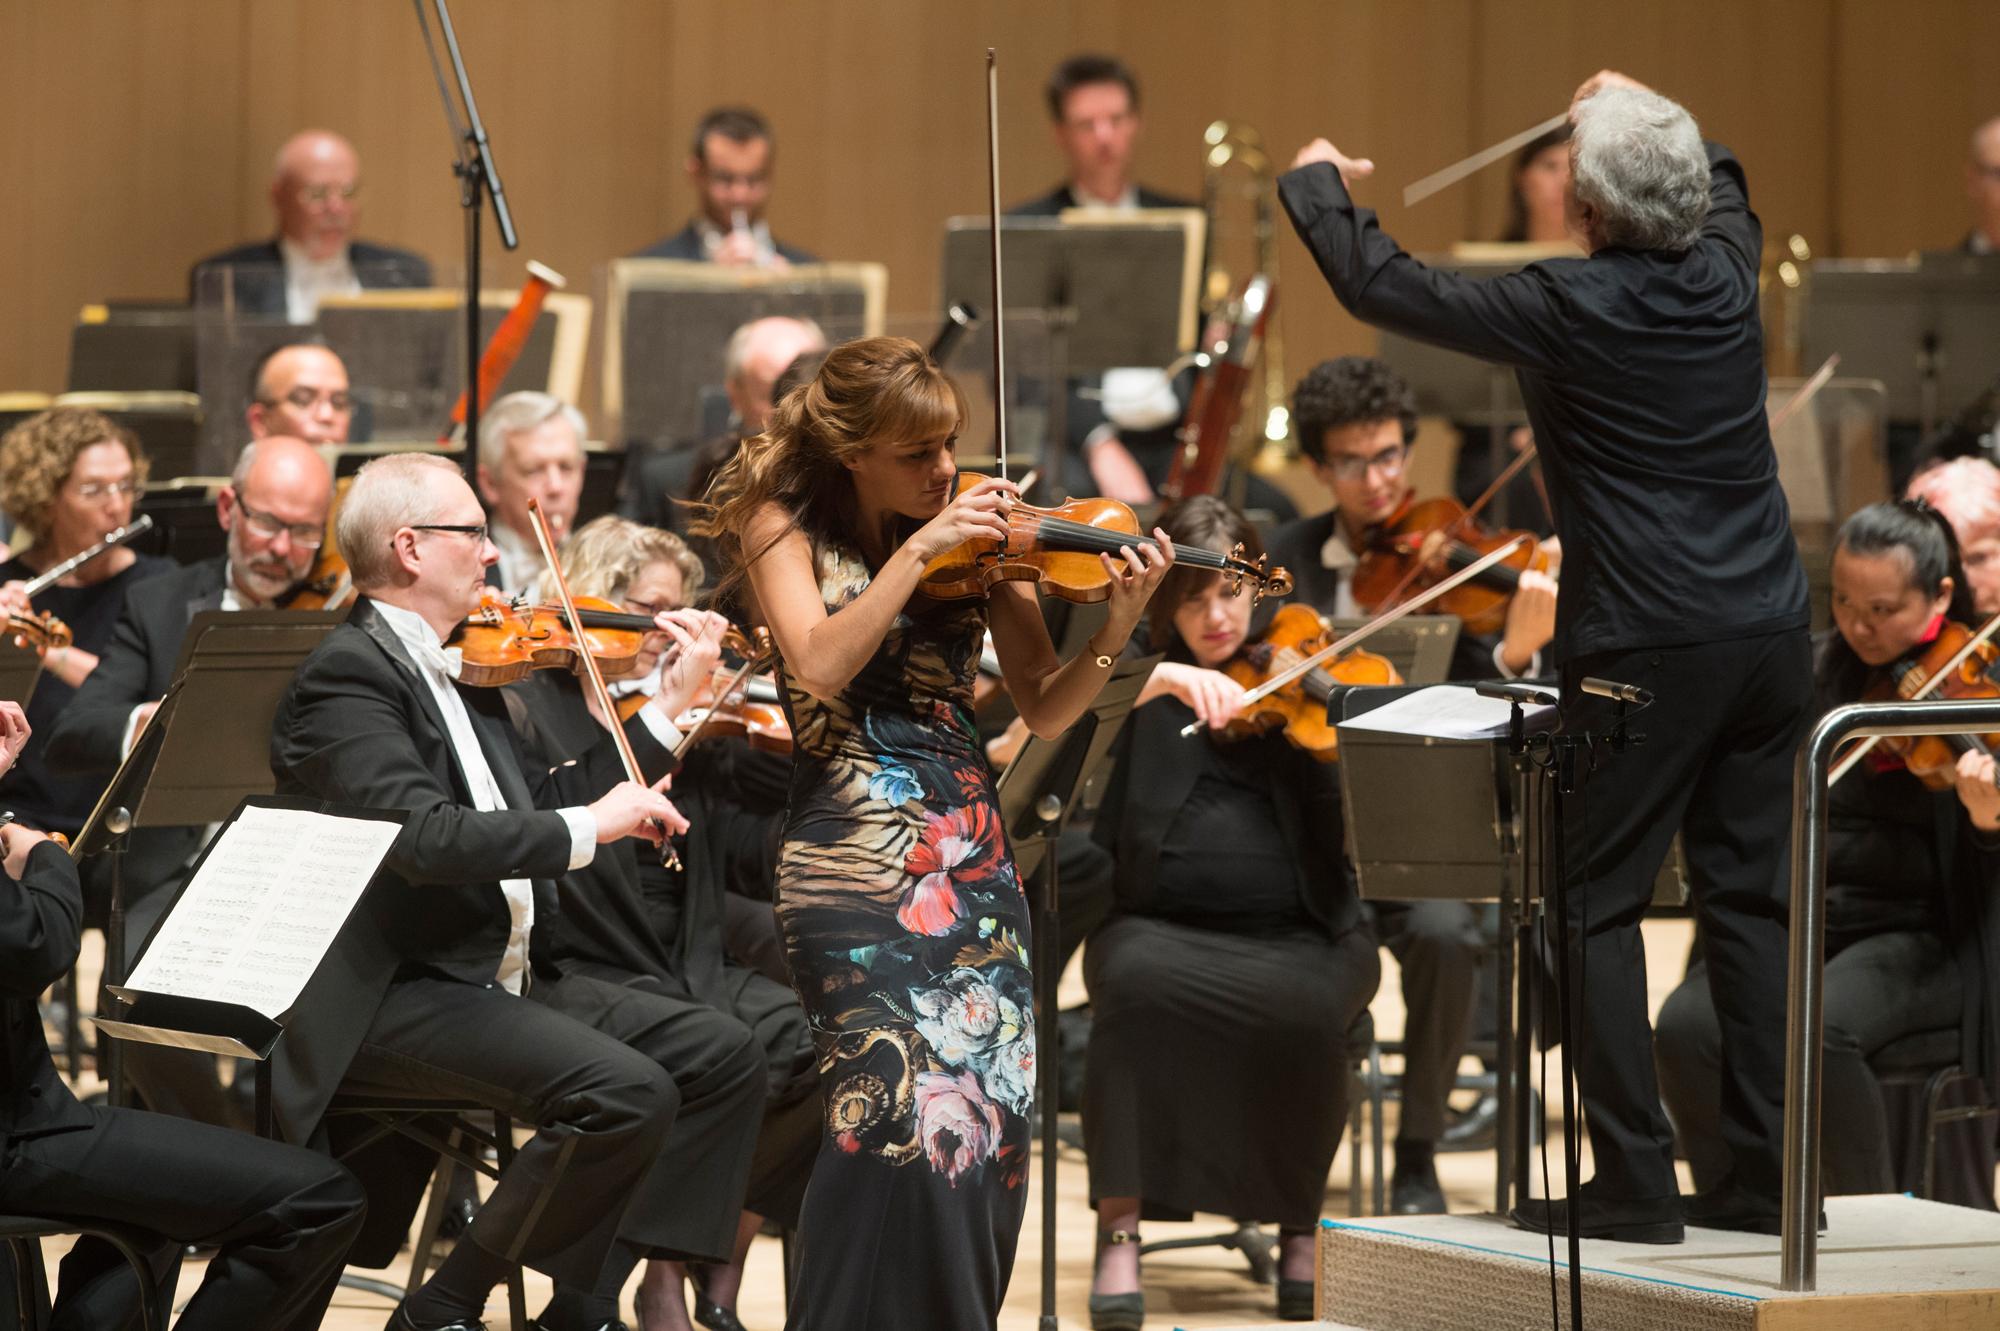 BWW Review: A Sensational Night of Music at the Toronto Symphony Orchestra's CARMINA BURANA